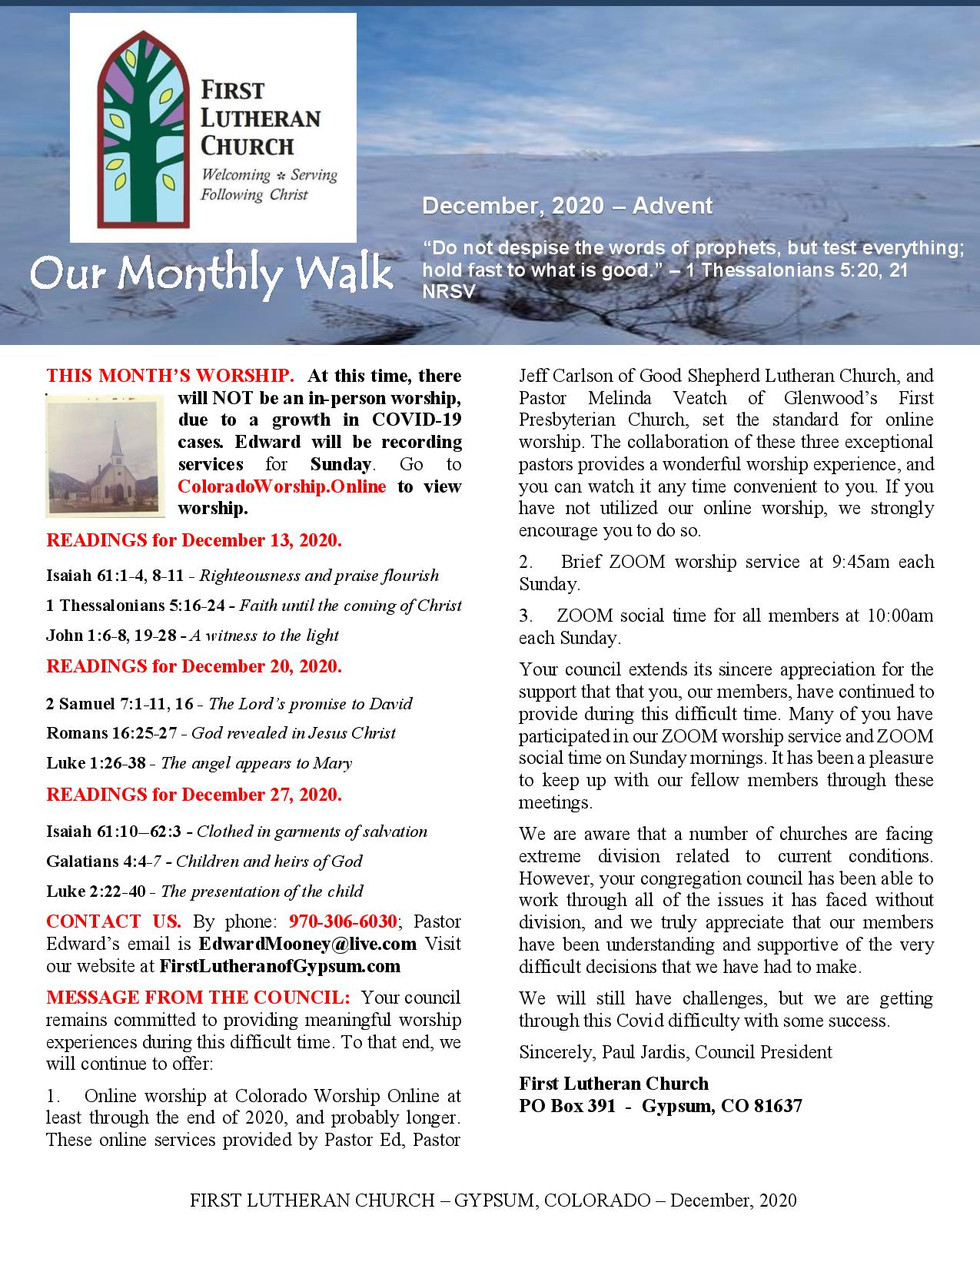 Newsletter, December, 2020, page 1